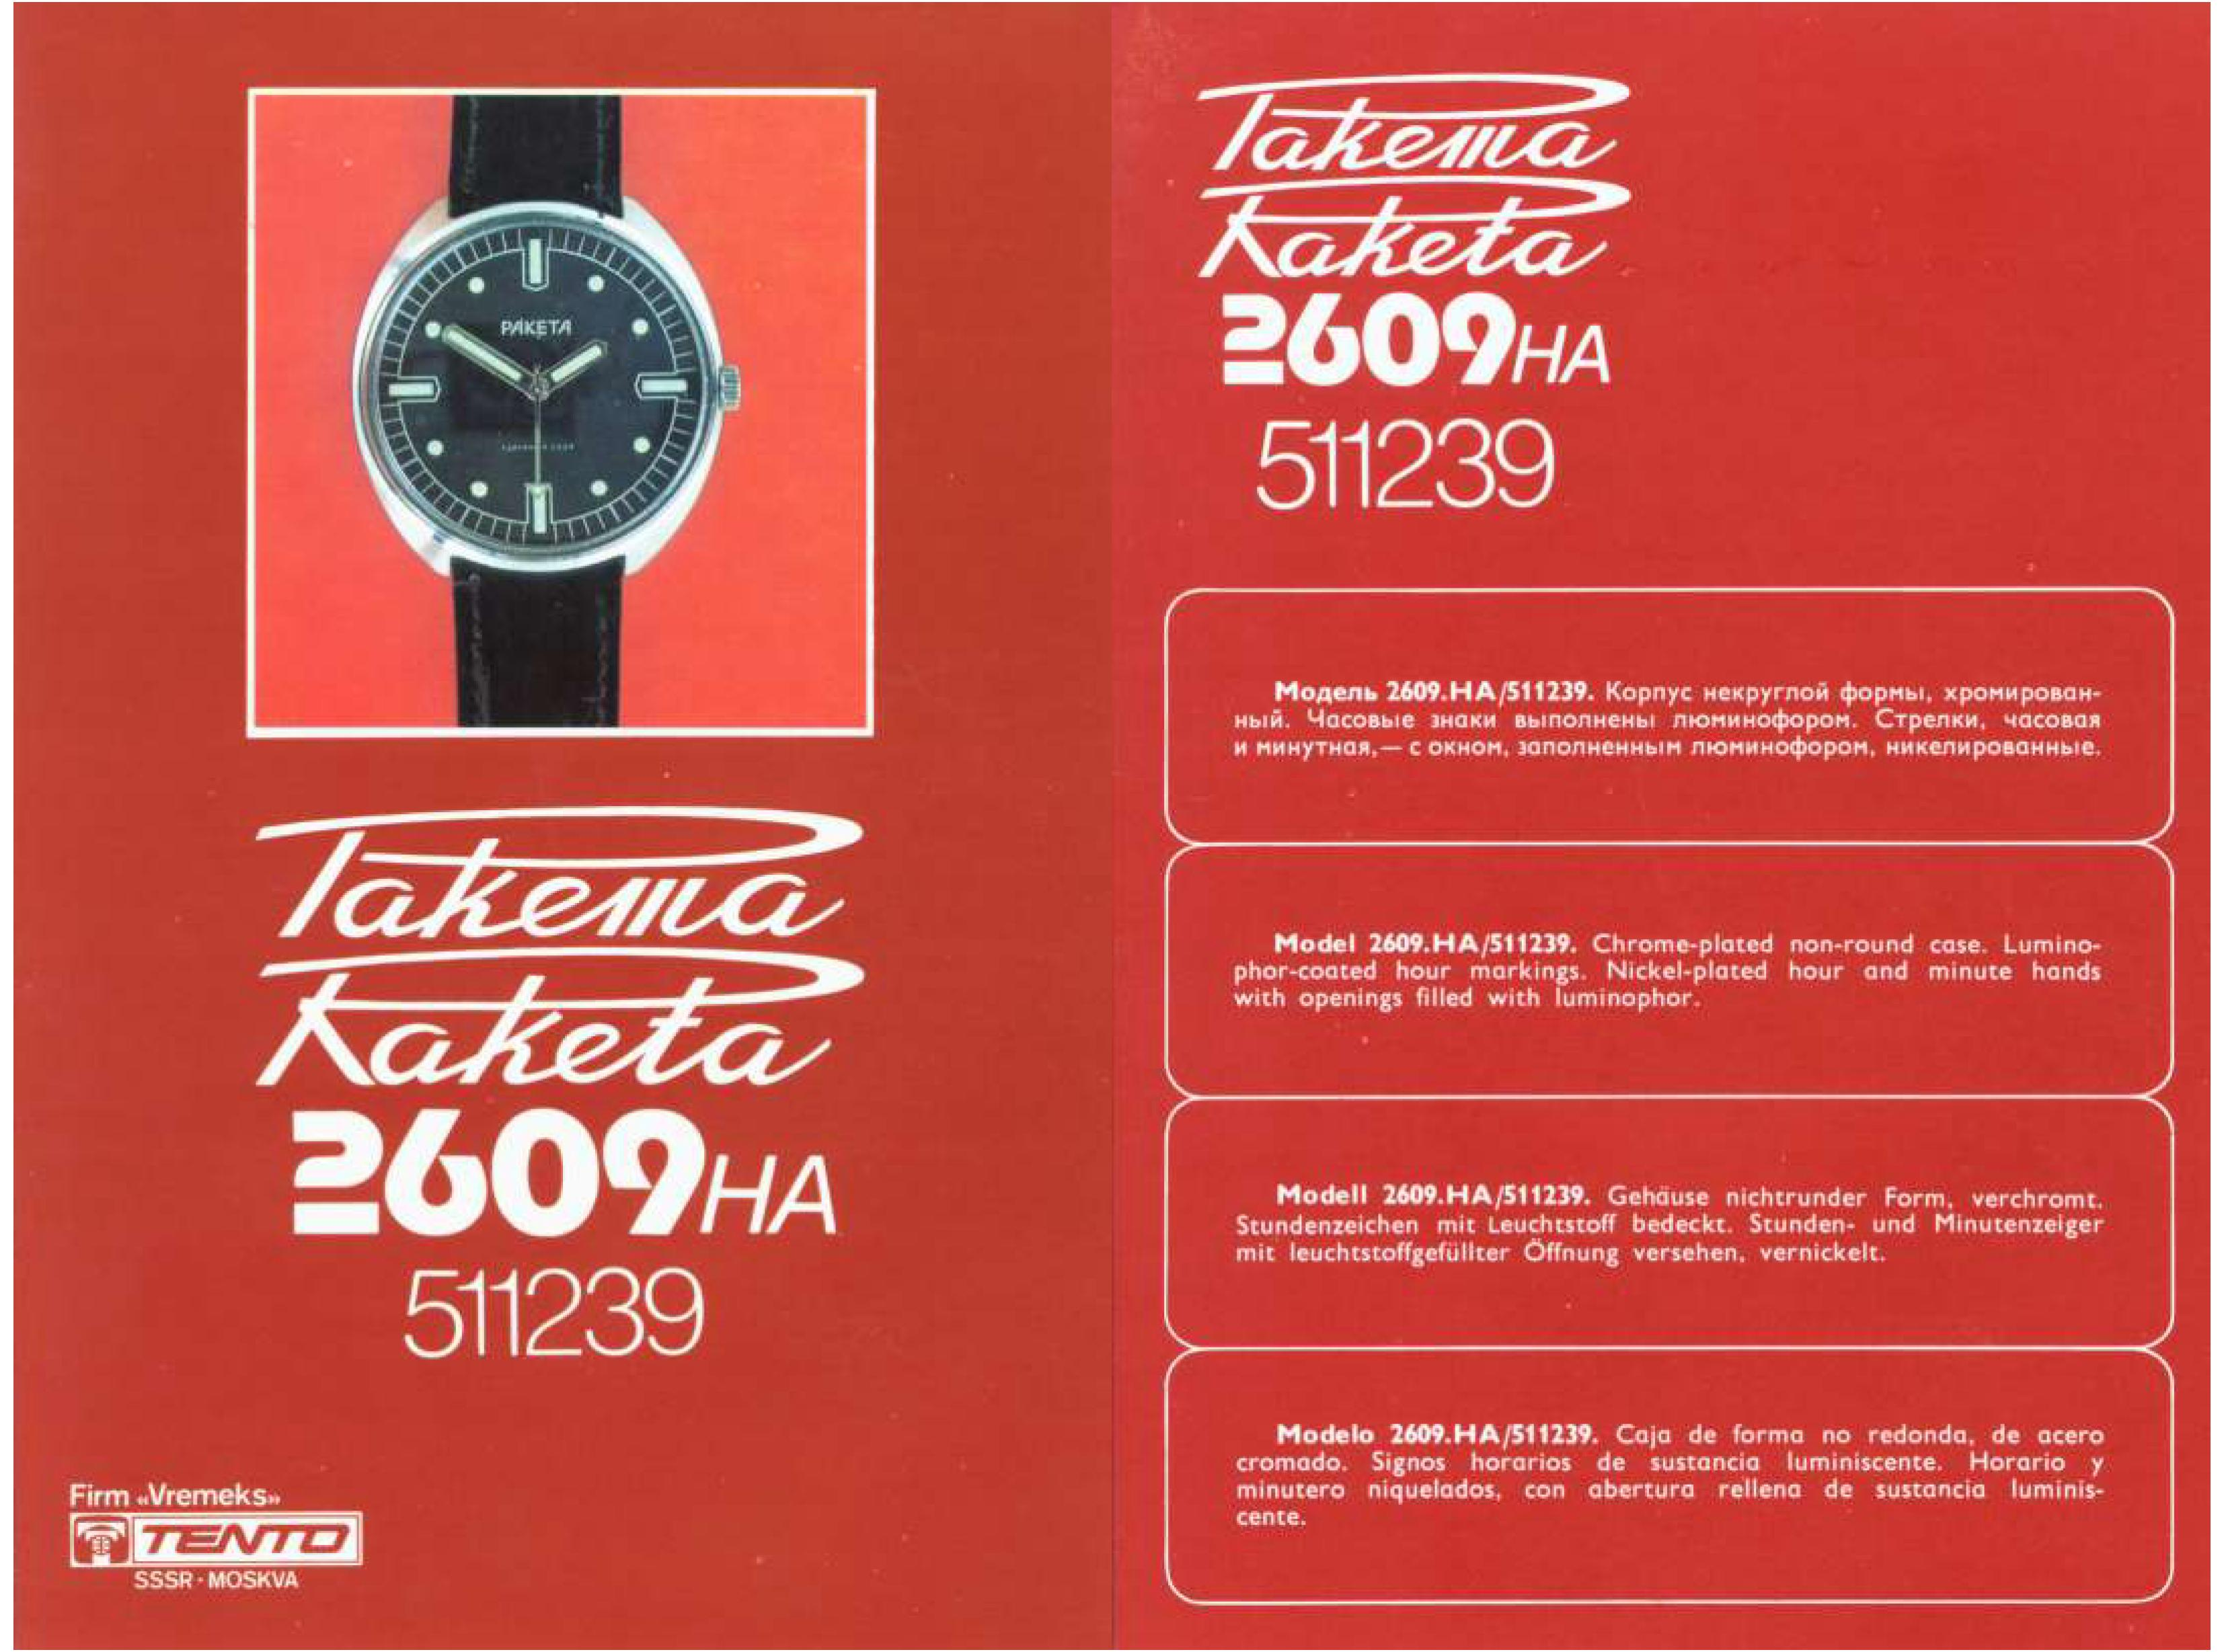 Name:  Raketa-by-m-watches-2609_1_20_09.jpg Views: 2357 Size:  593.6 KB